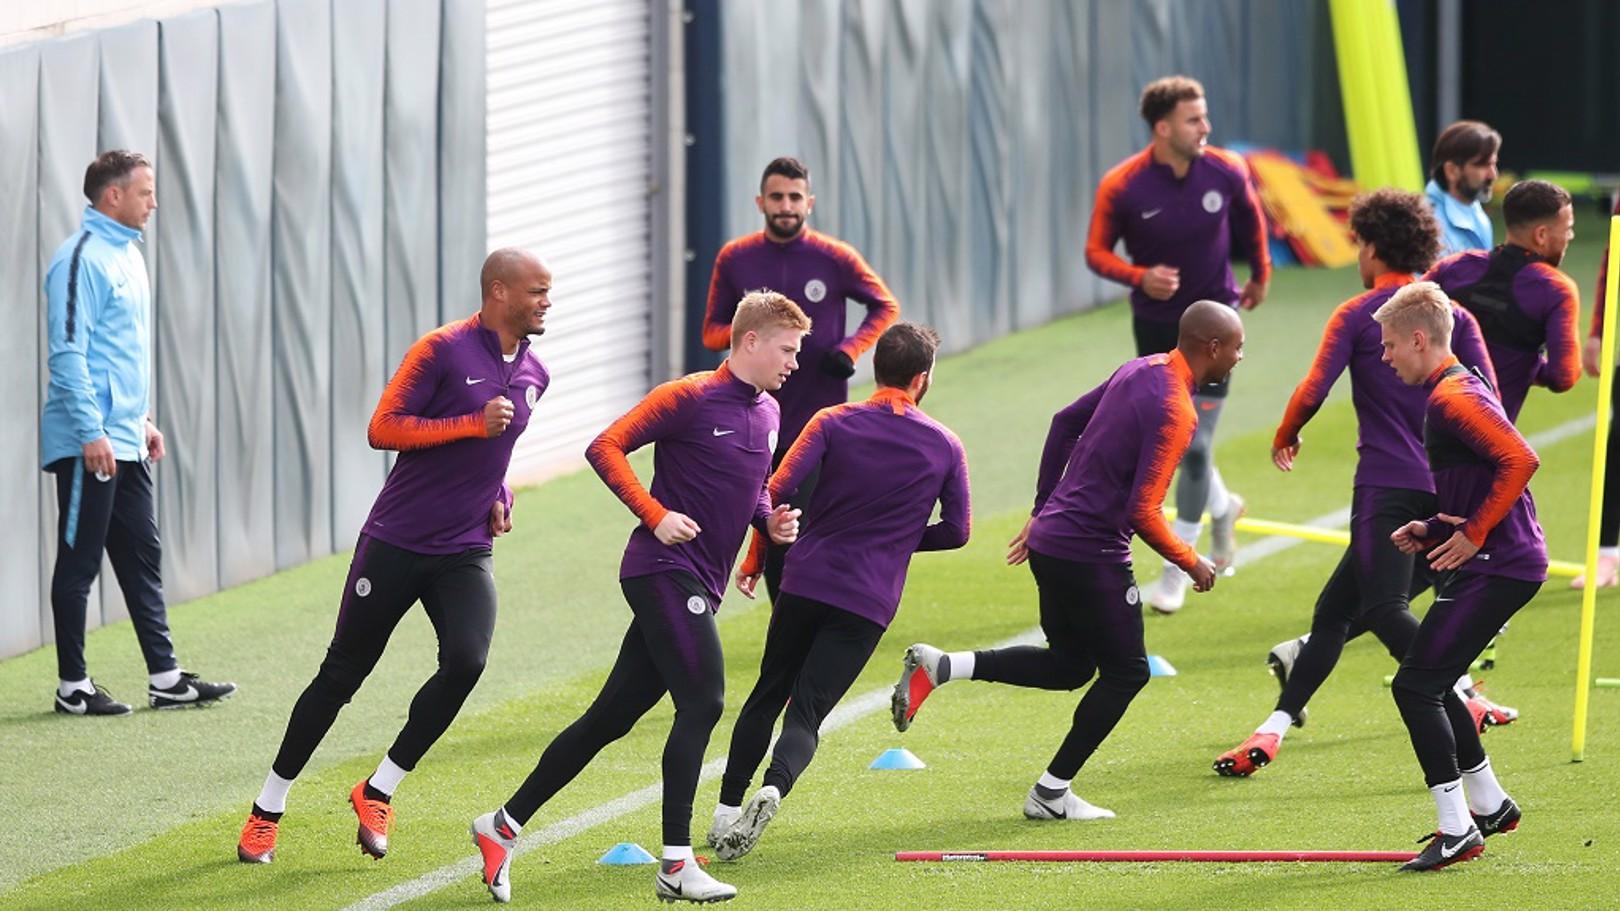 De Bruyne returns to training